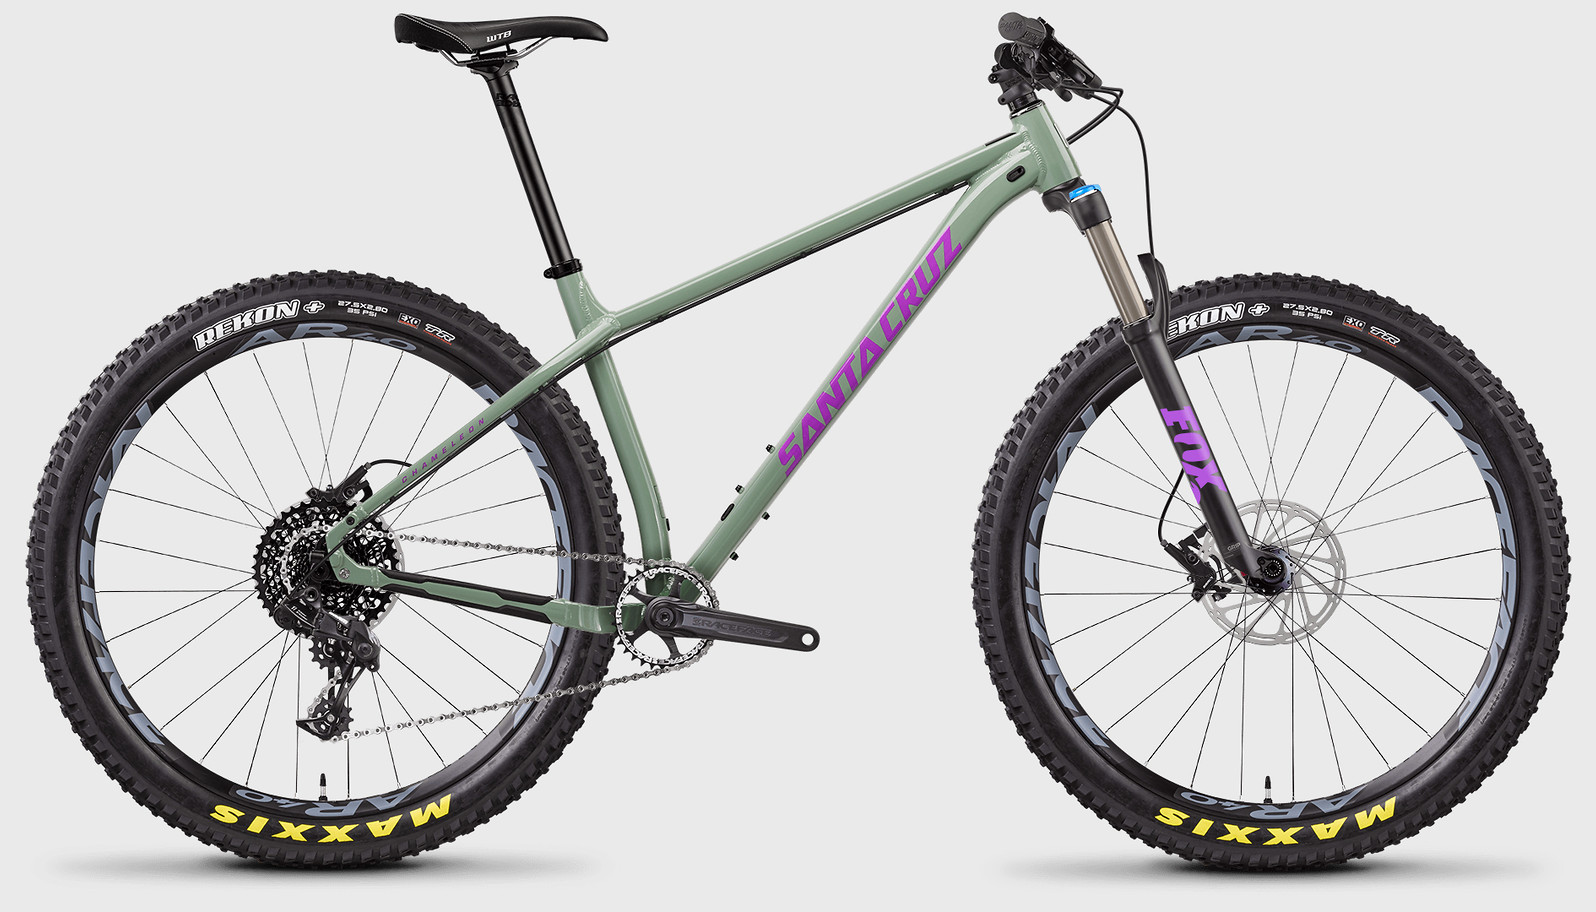 2017 Santa Cruz Chameleon R1  Bike